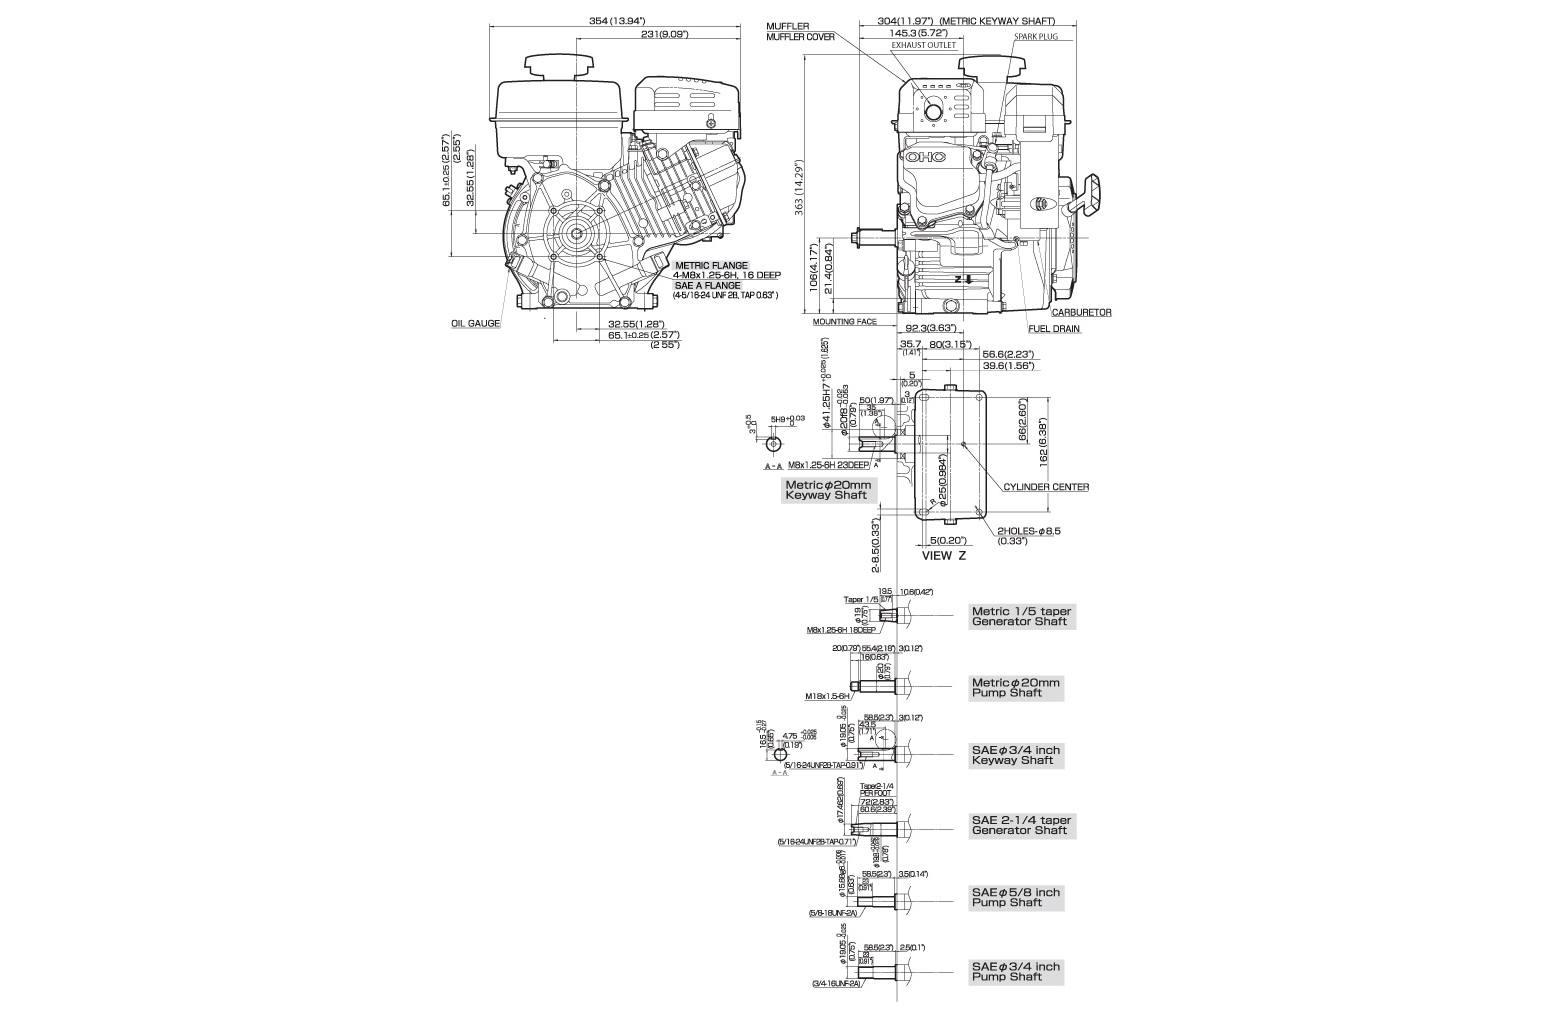 Hummer H2 Parts Catalogs Html